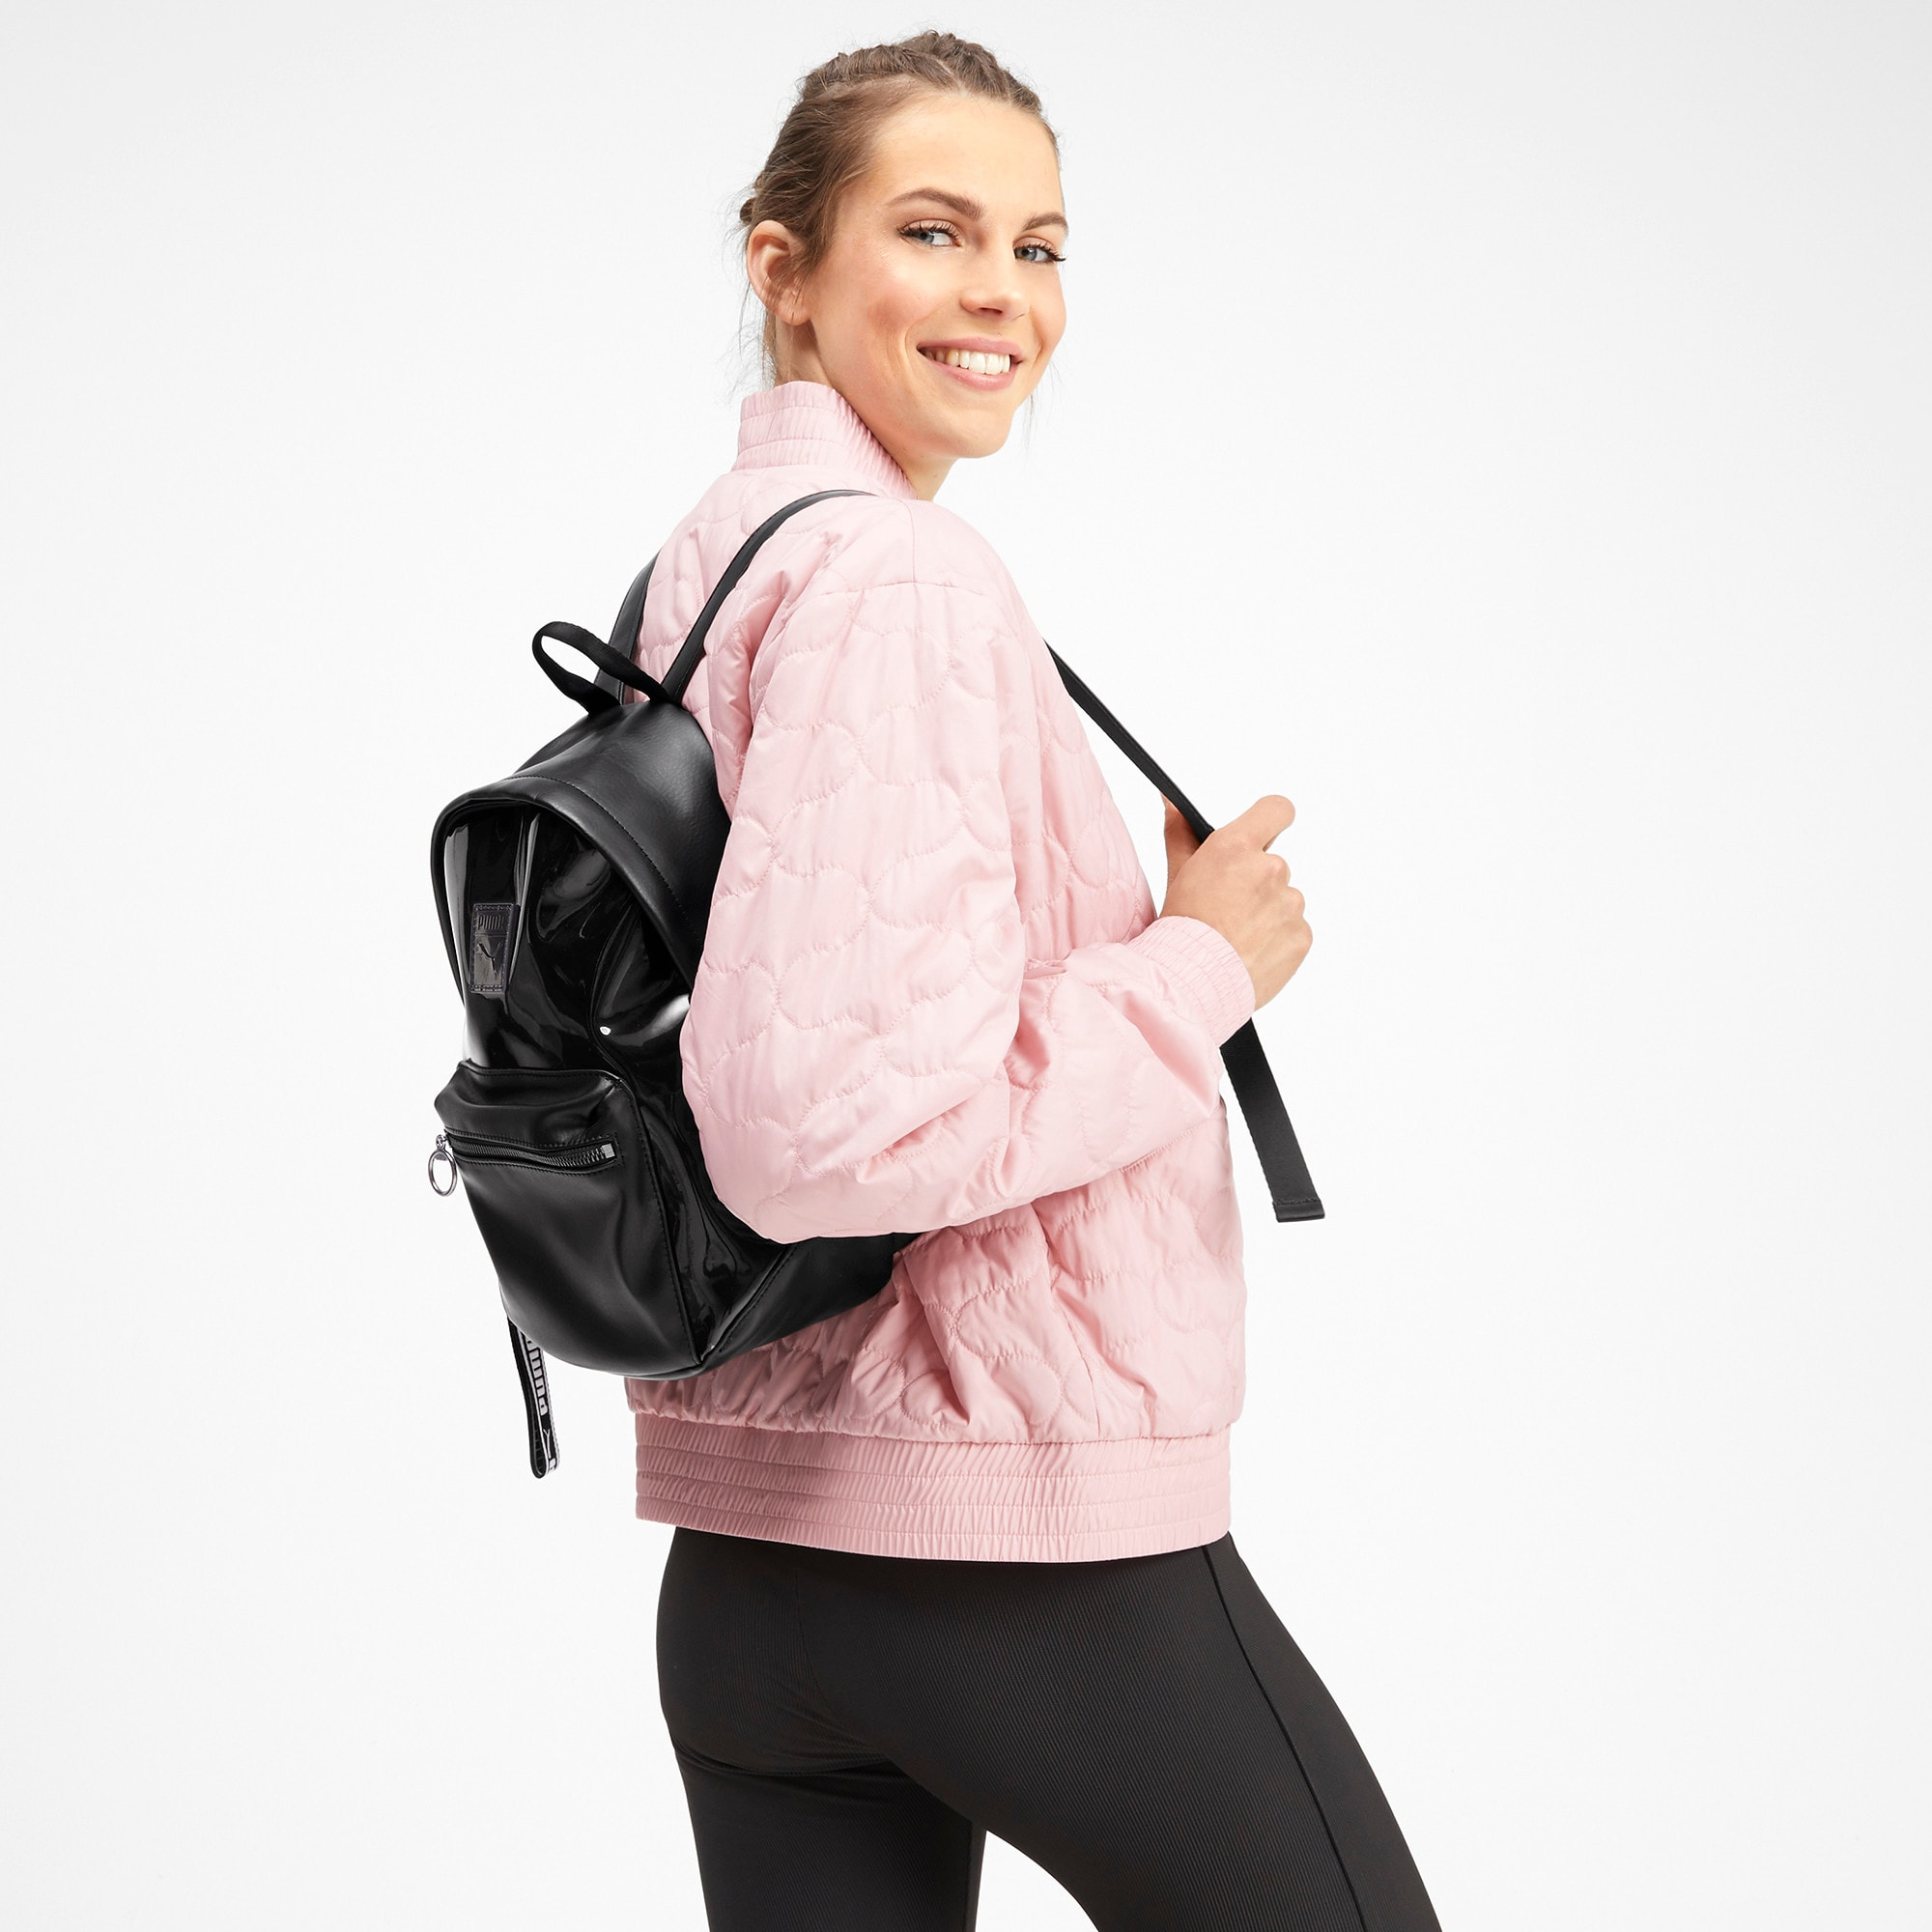 Thumbnail 2 of Premium Women's Backpack, Puma Black, medium-IND